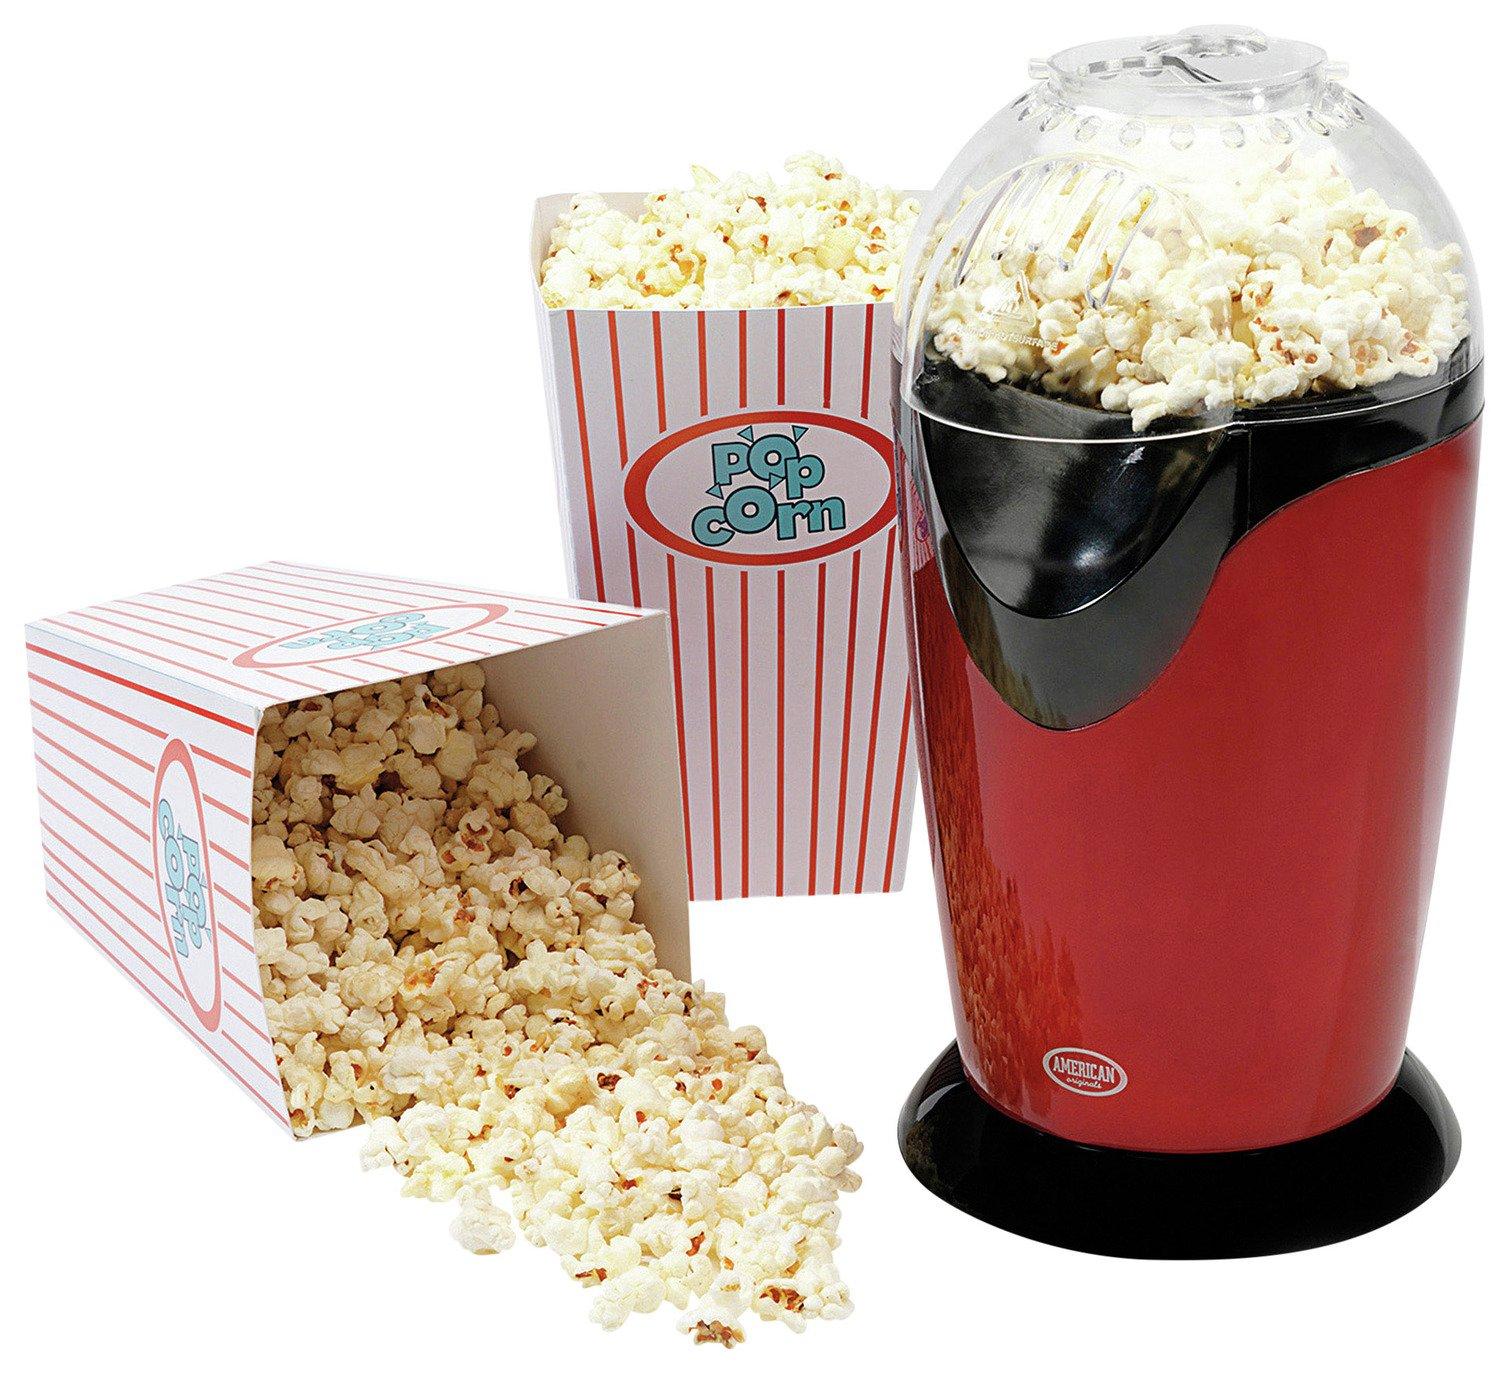 american originals popcorn maker - Popcorn Makers